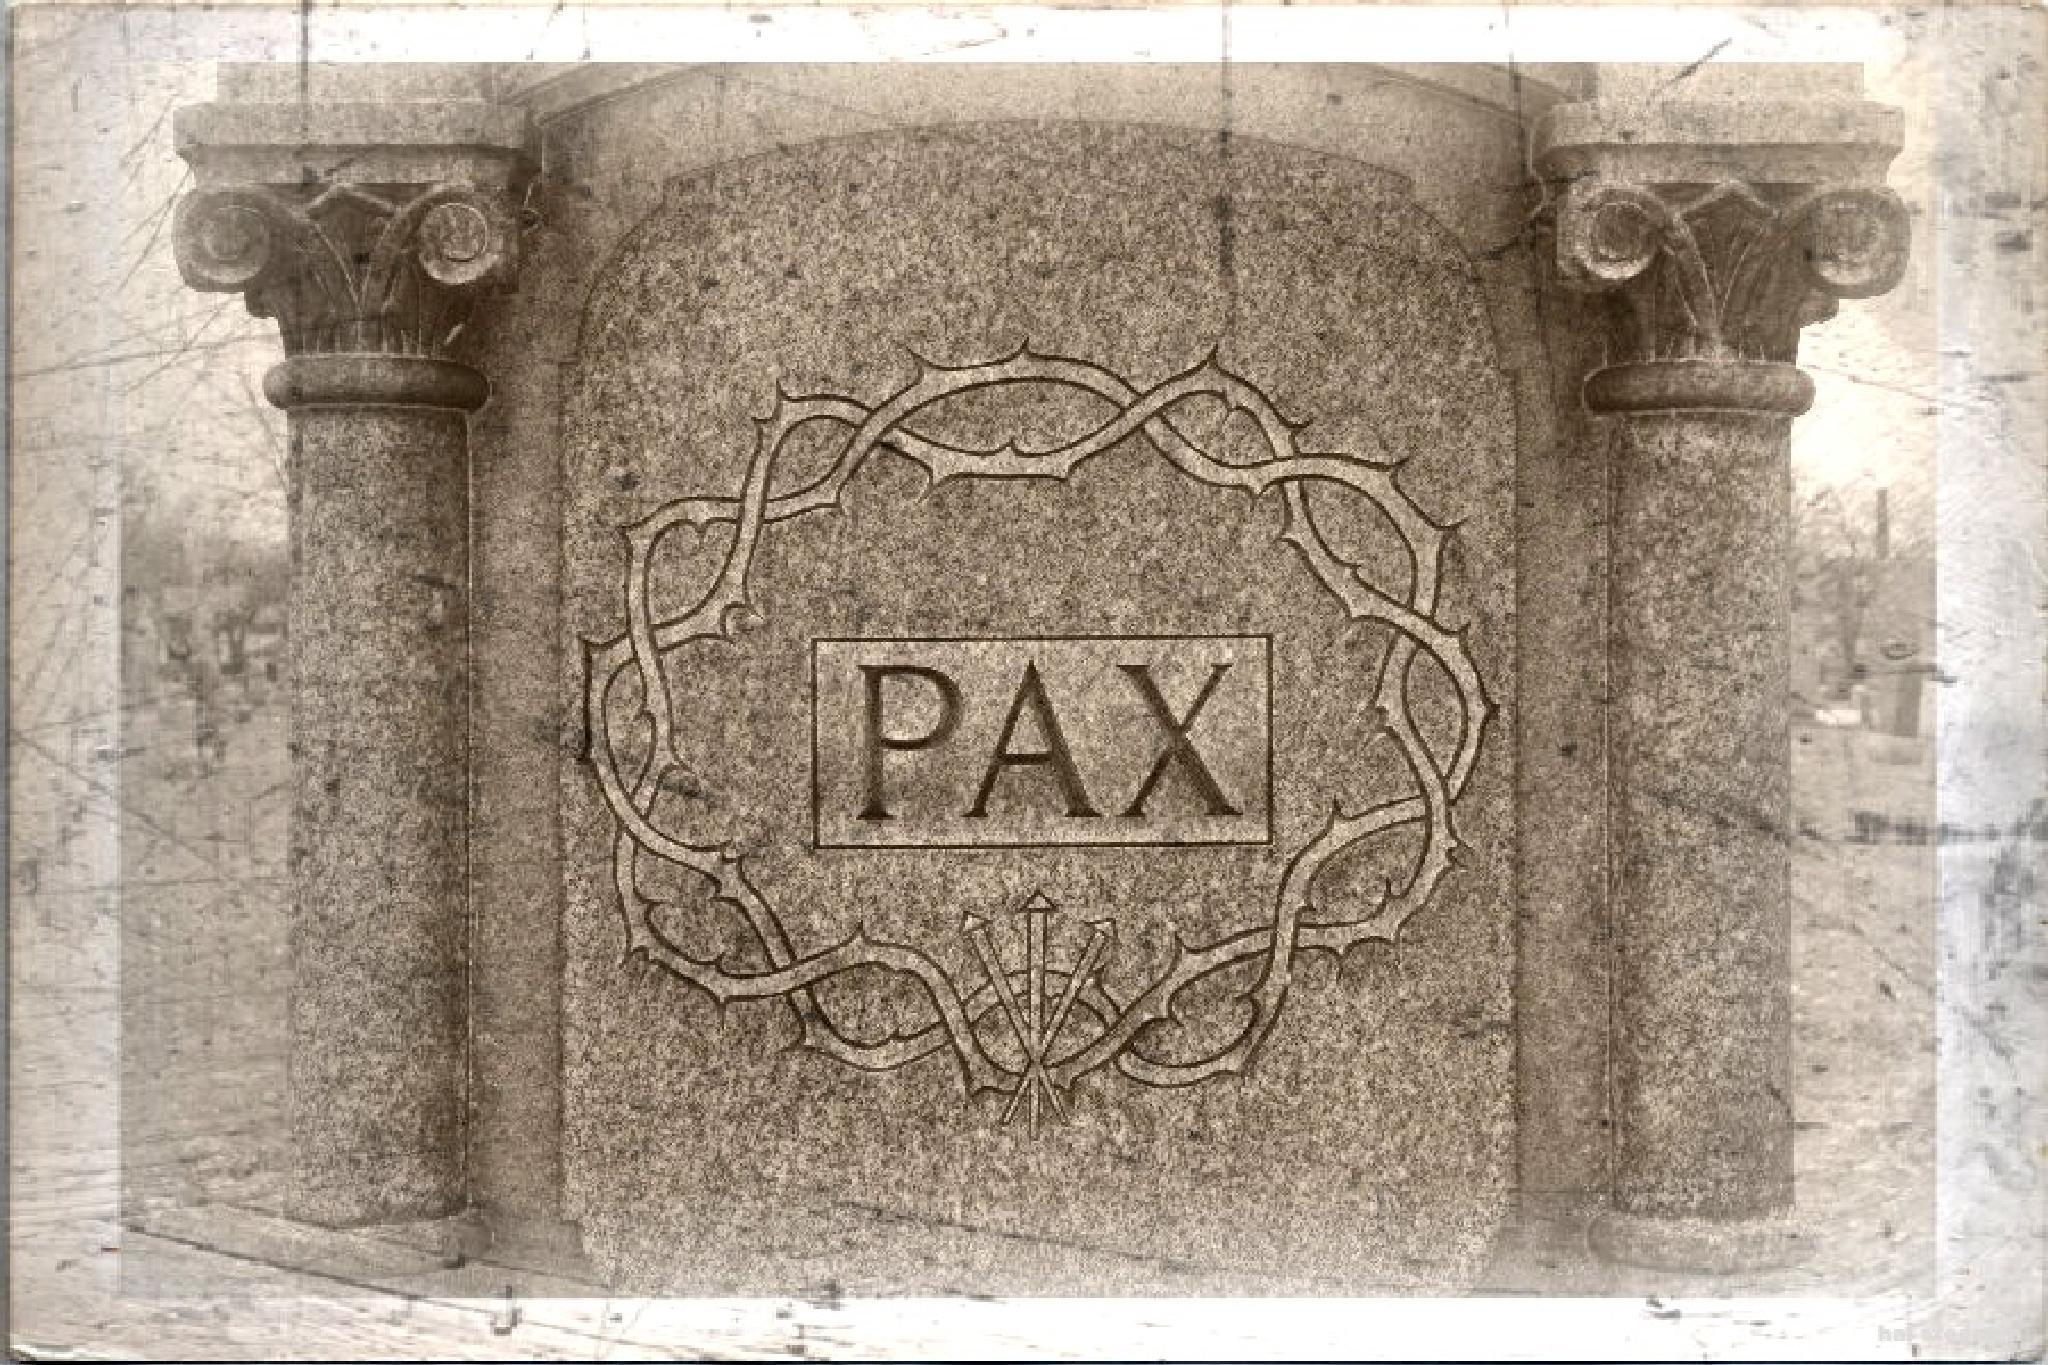 Pax by Hal Stedman